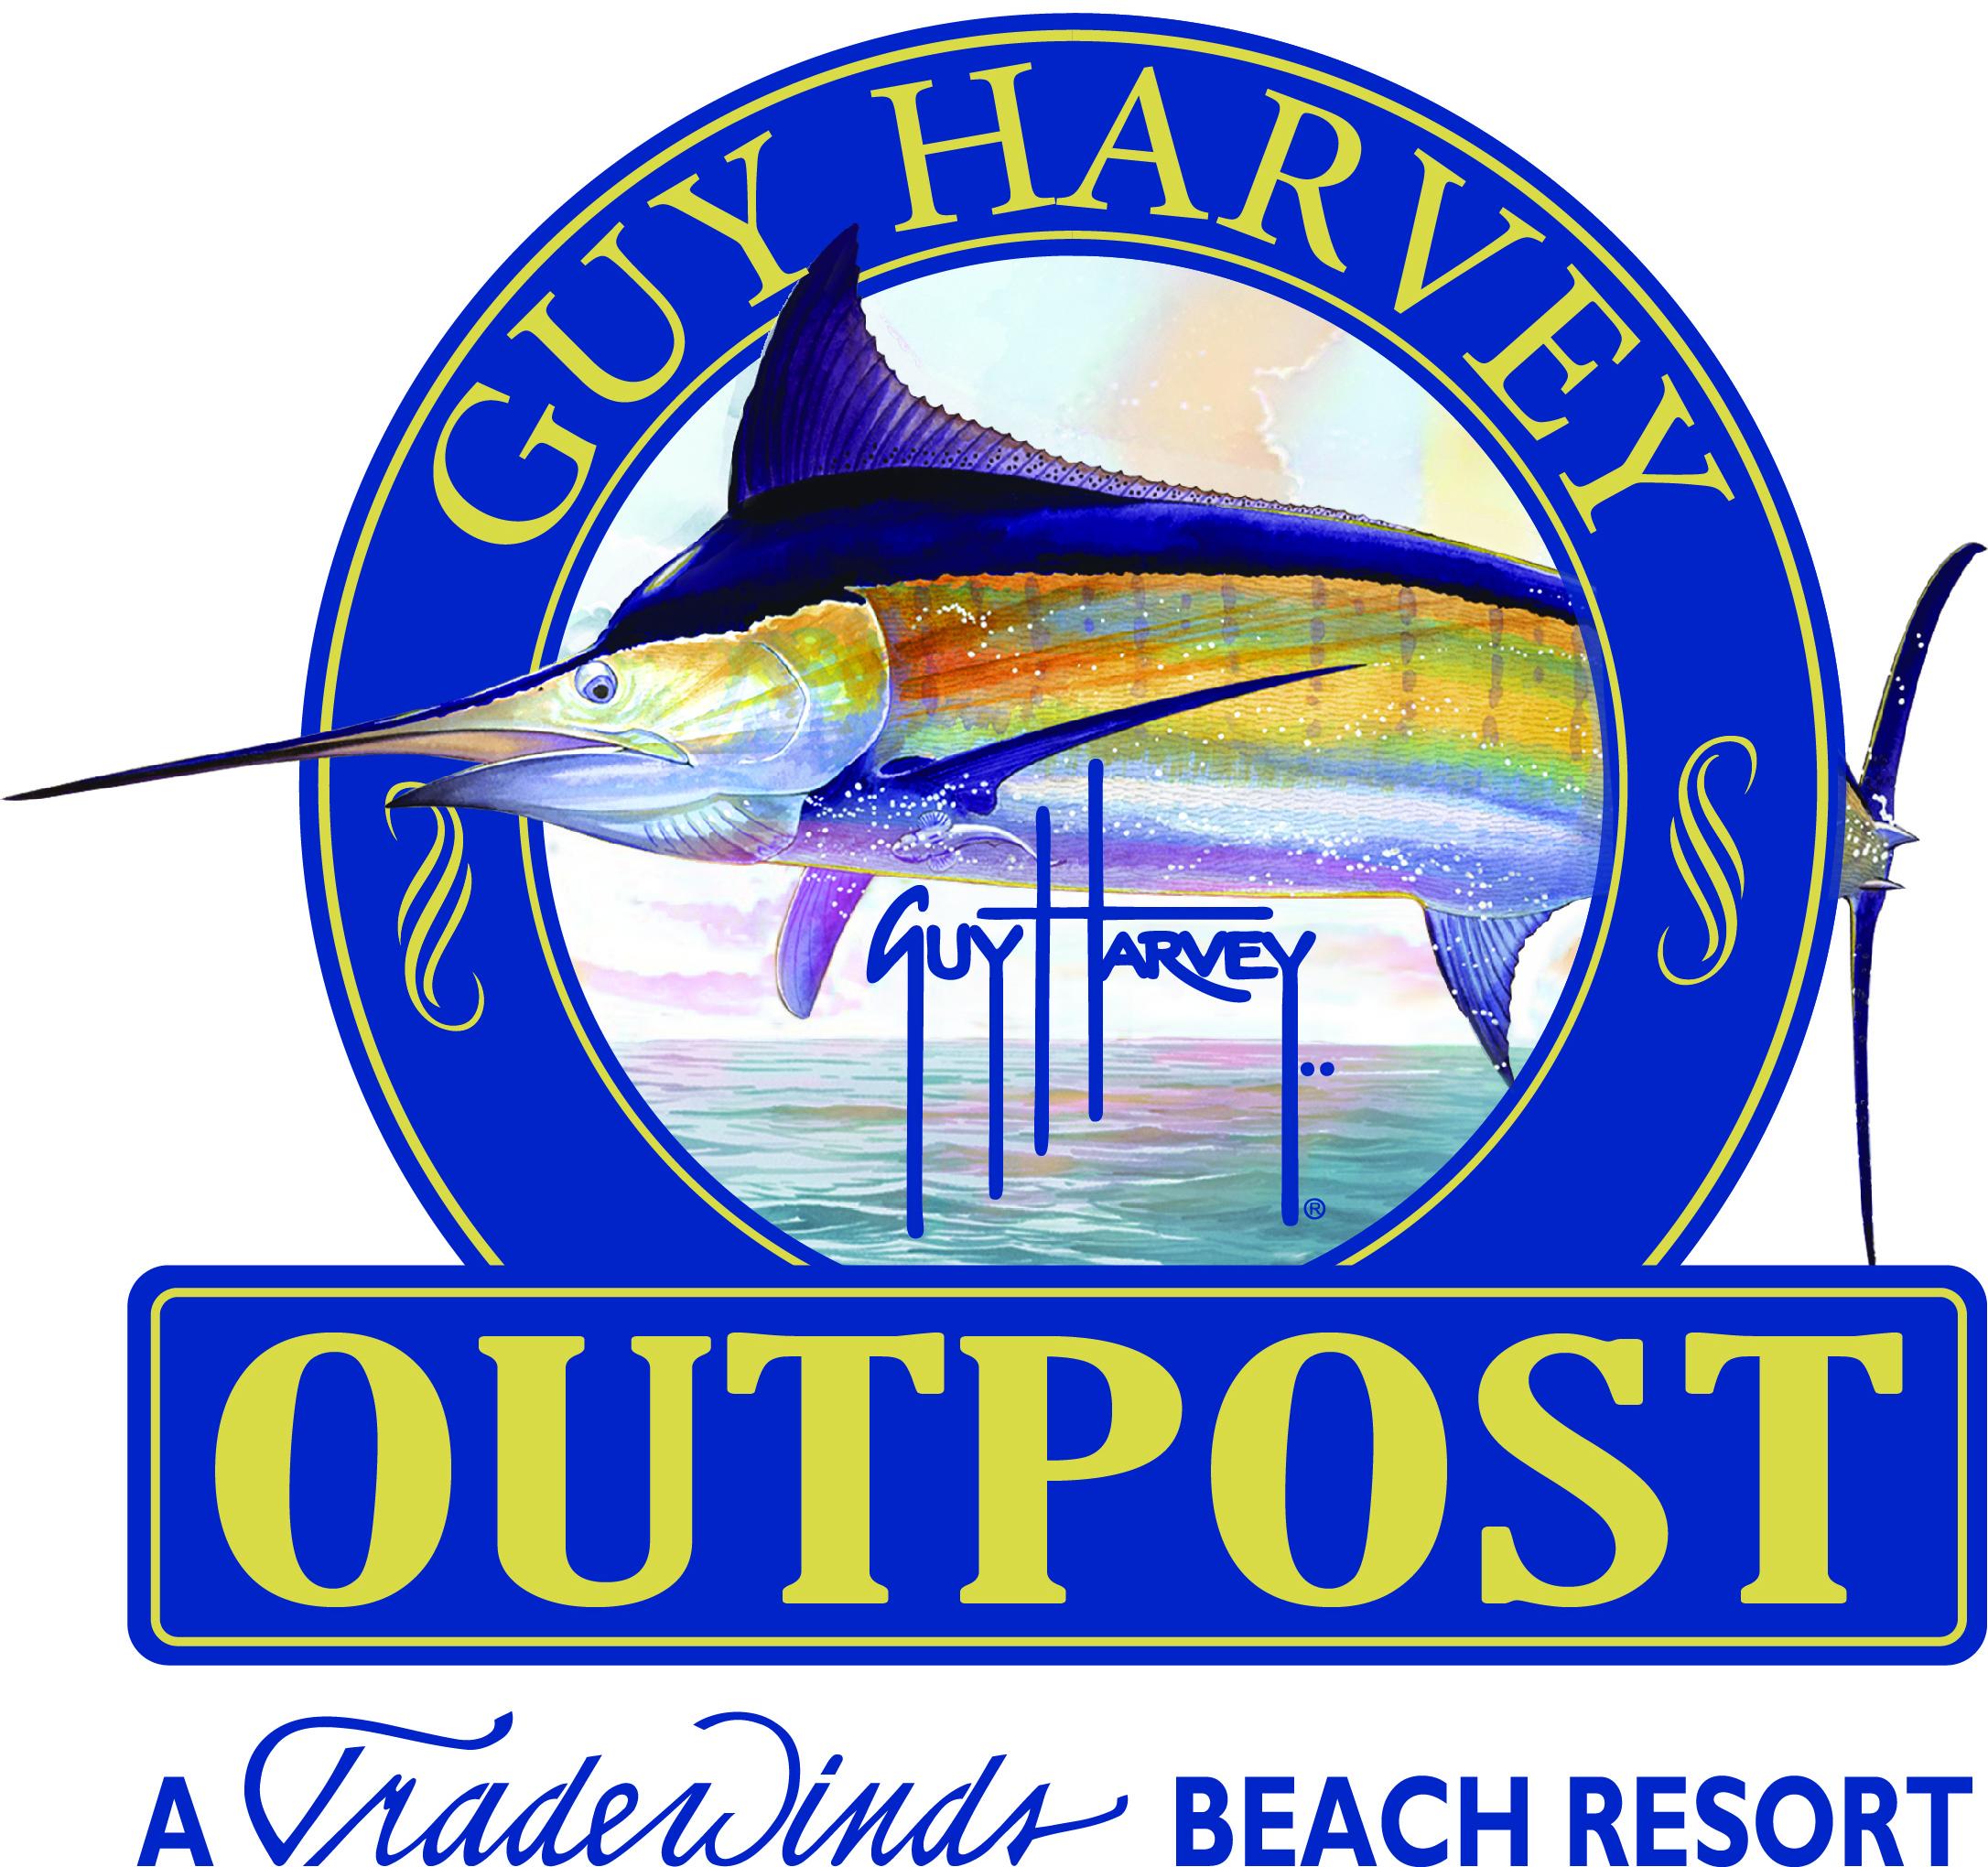 Guy Harvey Outpost To Open St Pete Beach Resort Guy Harvey